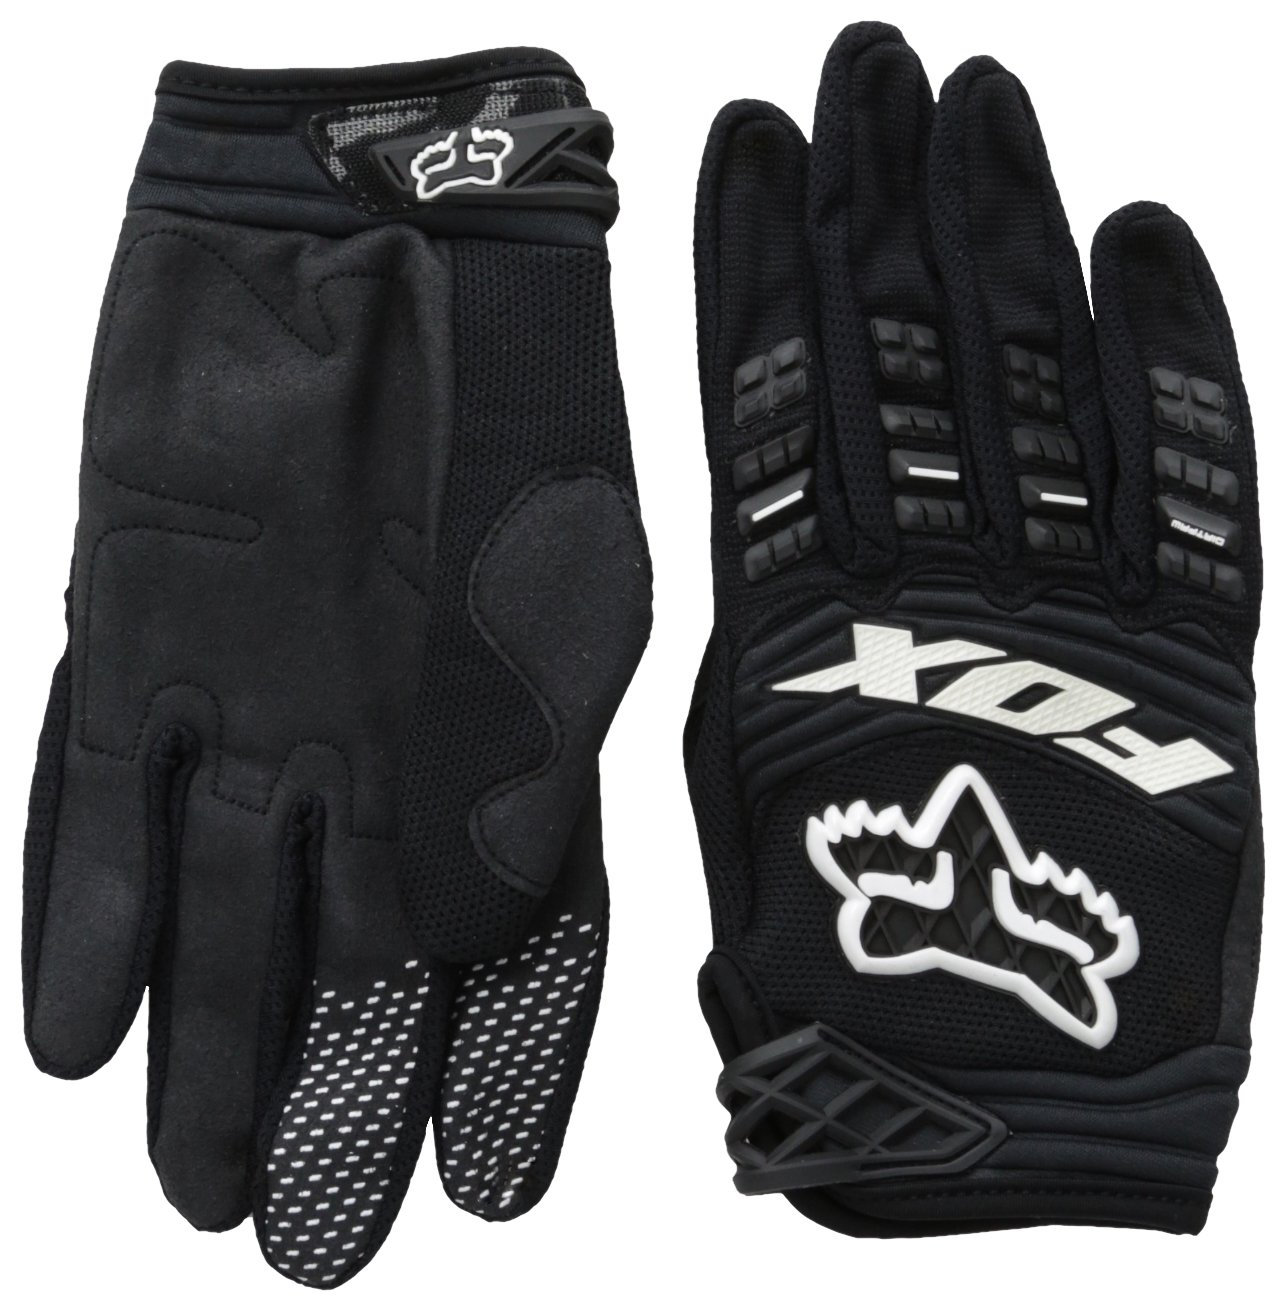 2014 Fox Head Men's Dirtpaw Race Glove Black, Medium